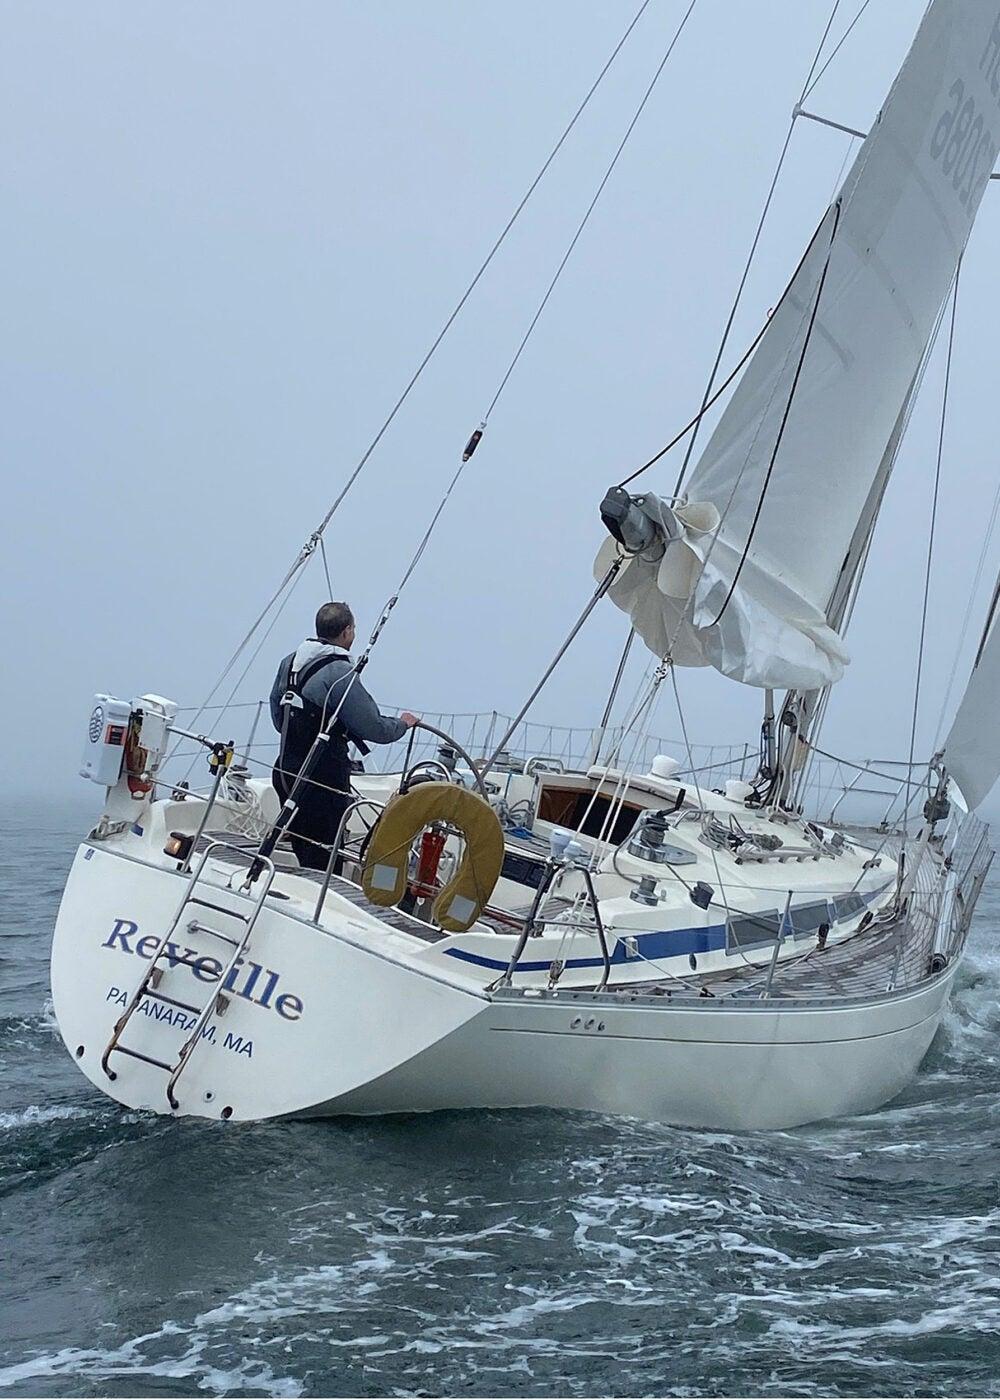 Man in sailboat.